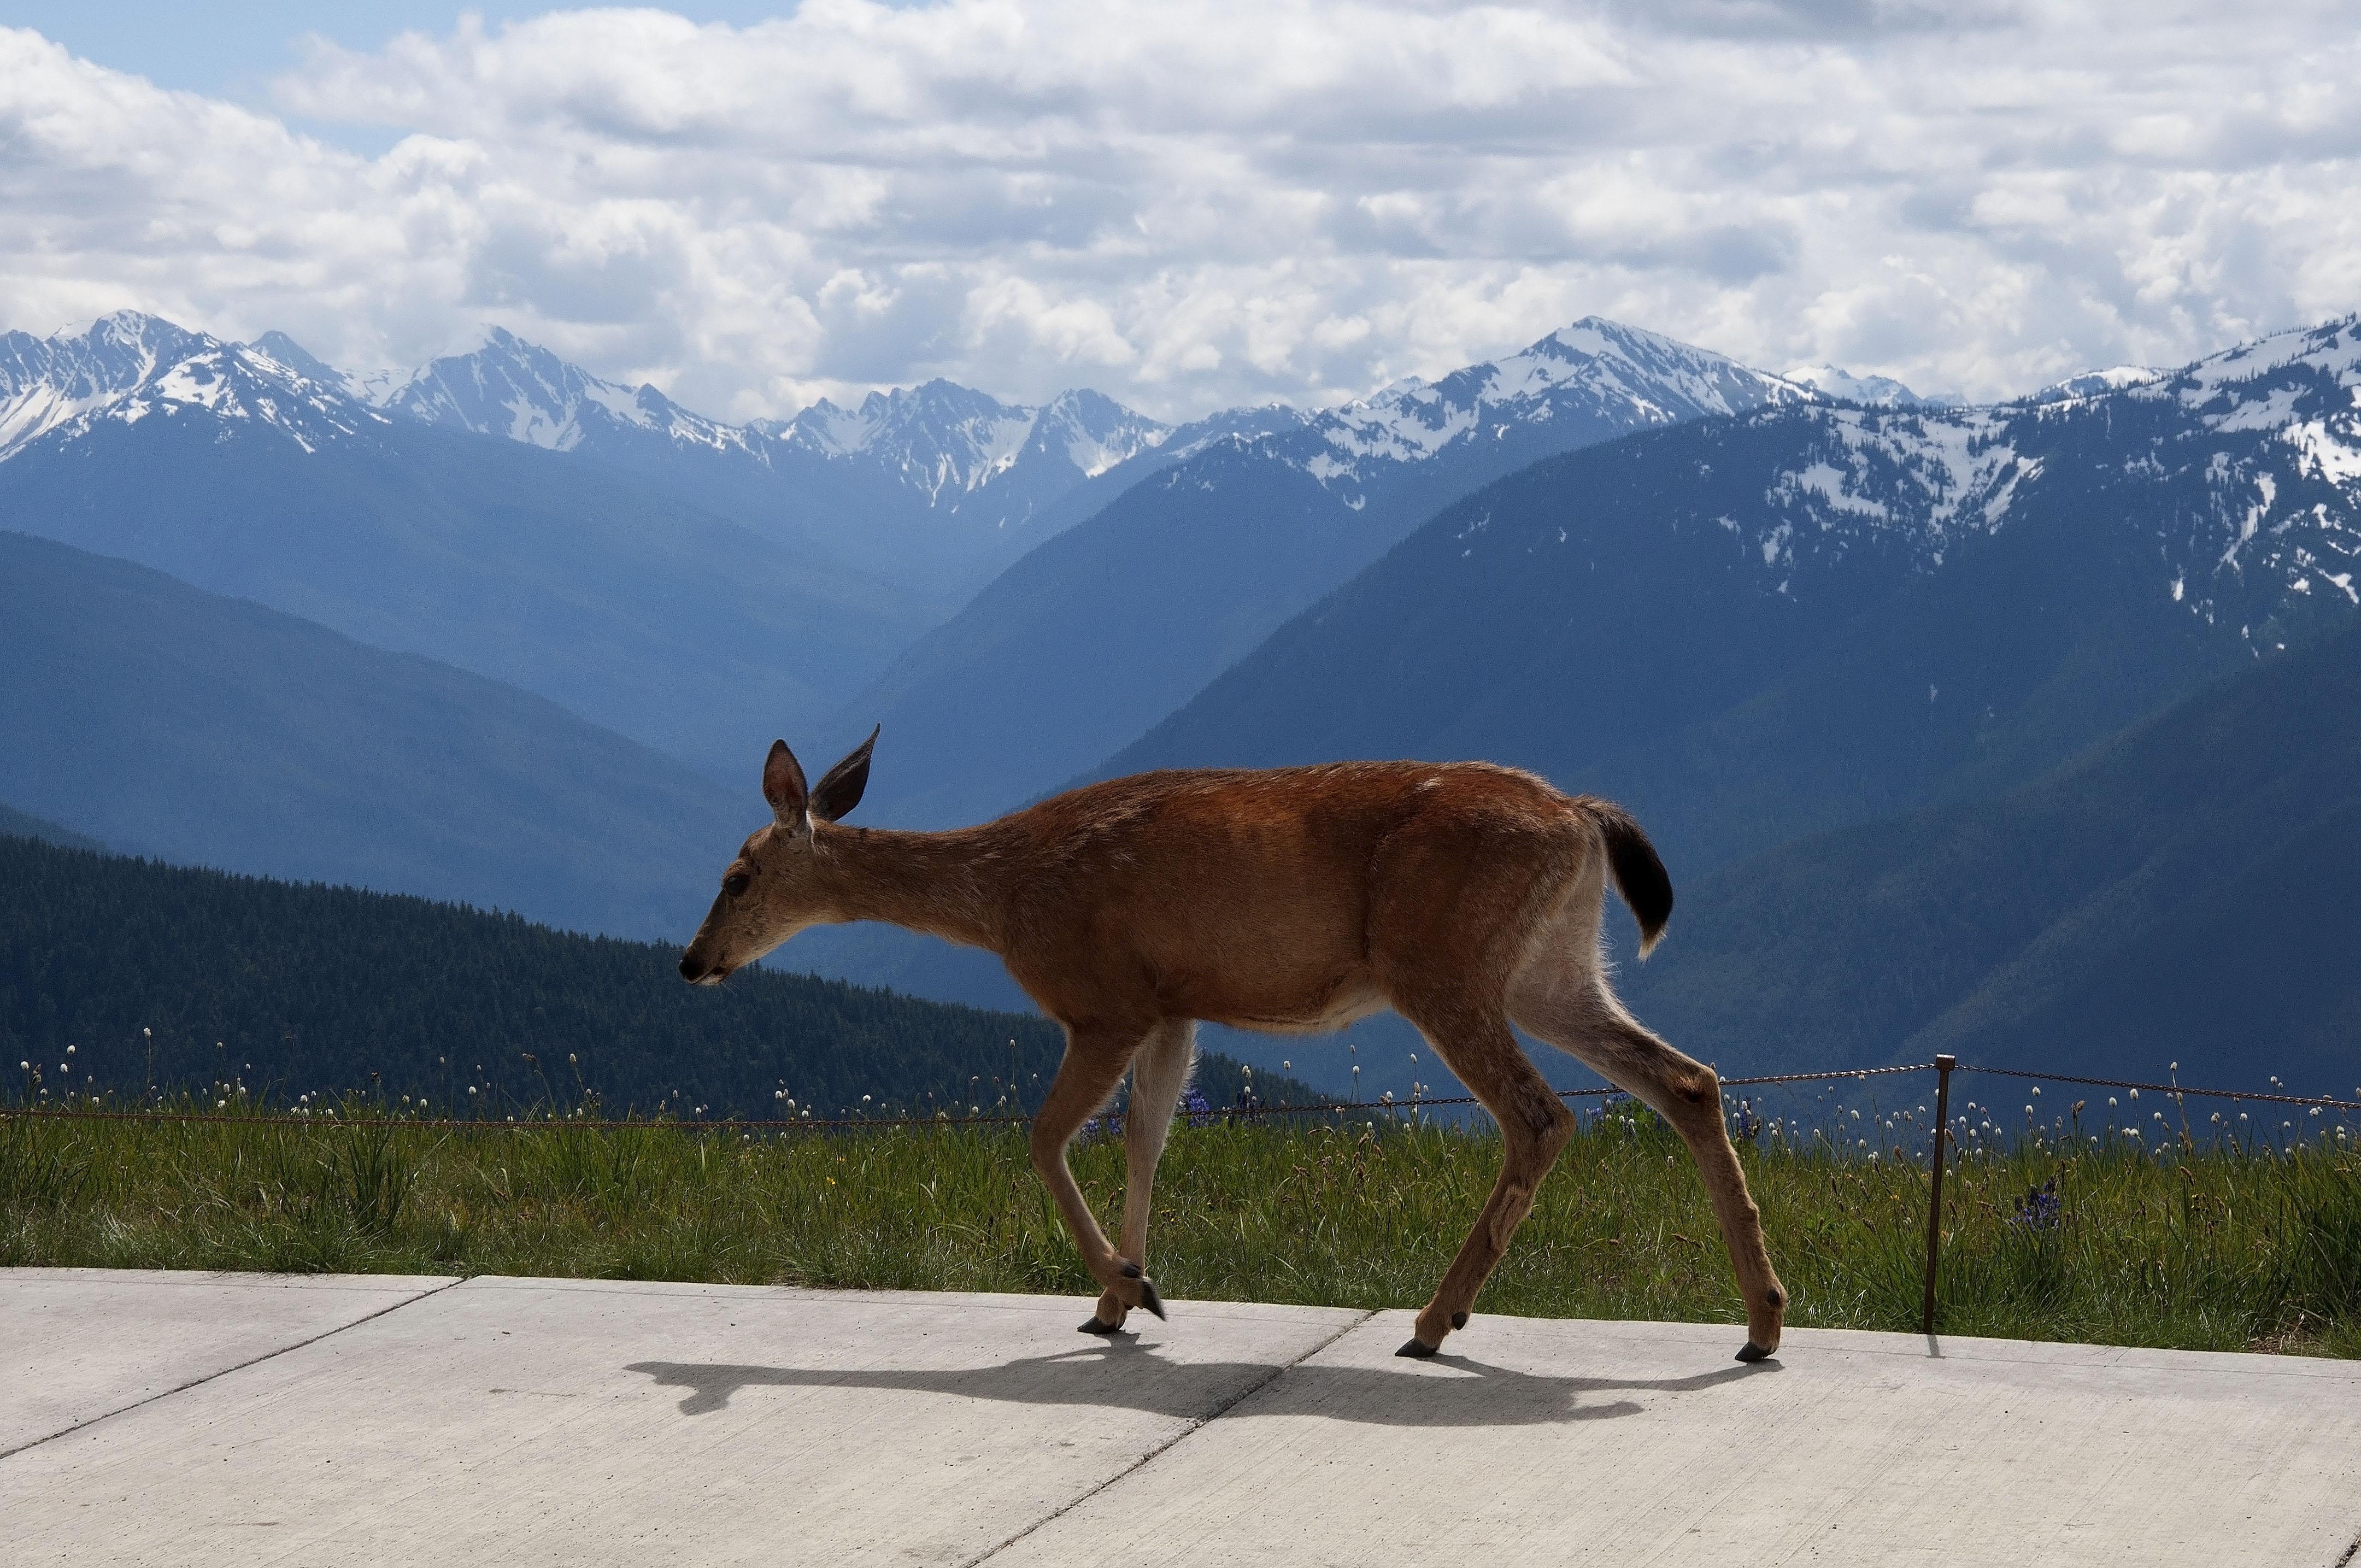 Deer on sidewalk, Hurricane Ridge, Washington, July 2011